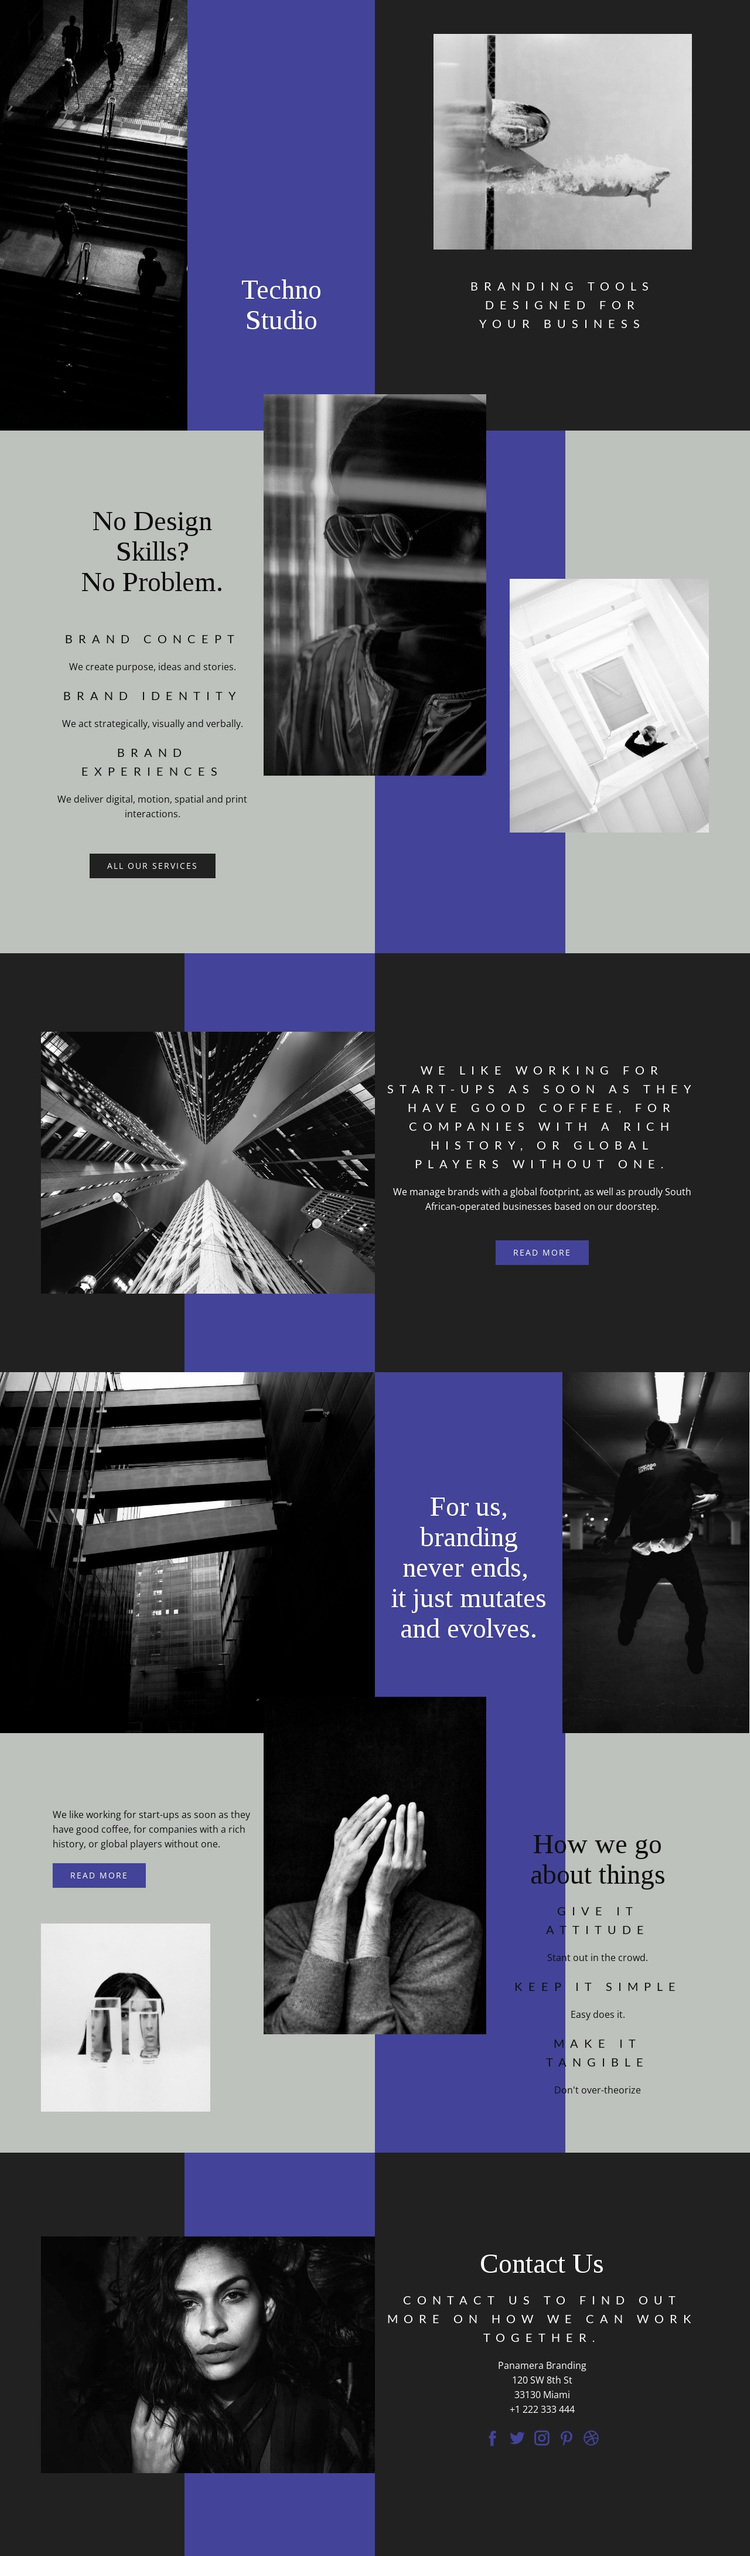 Techno skills in business Website Design